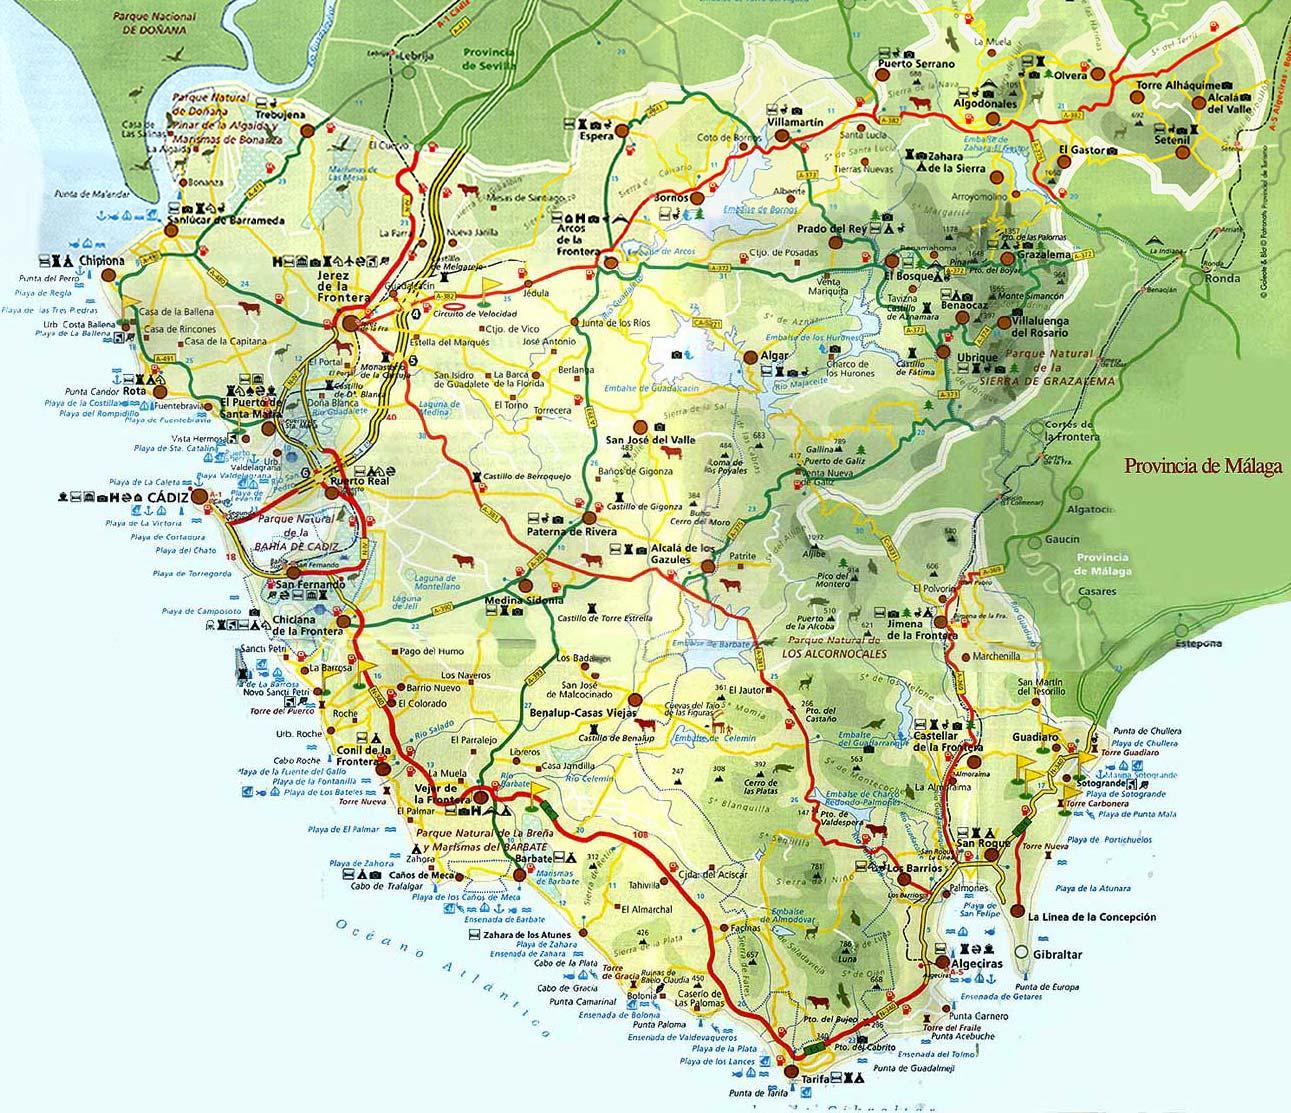 Mapa de carreteras de la Provincia de Cádiz